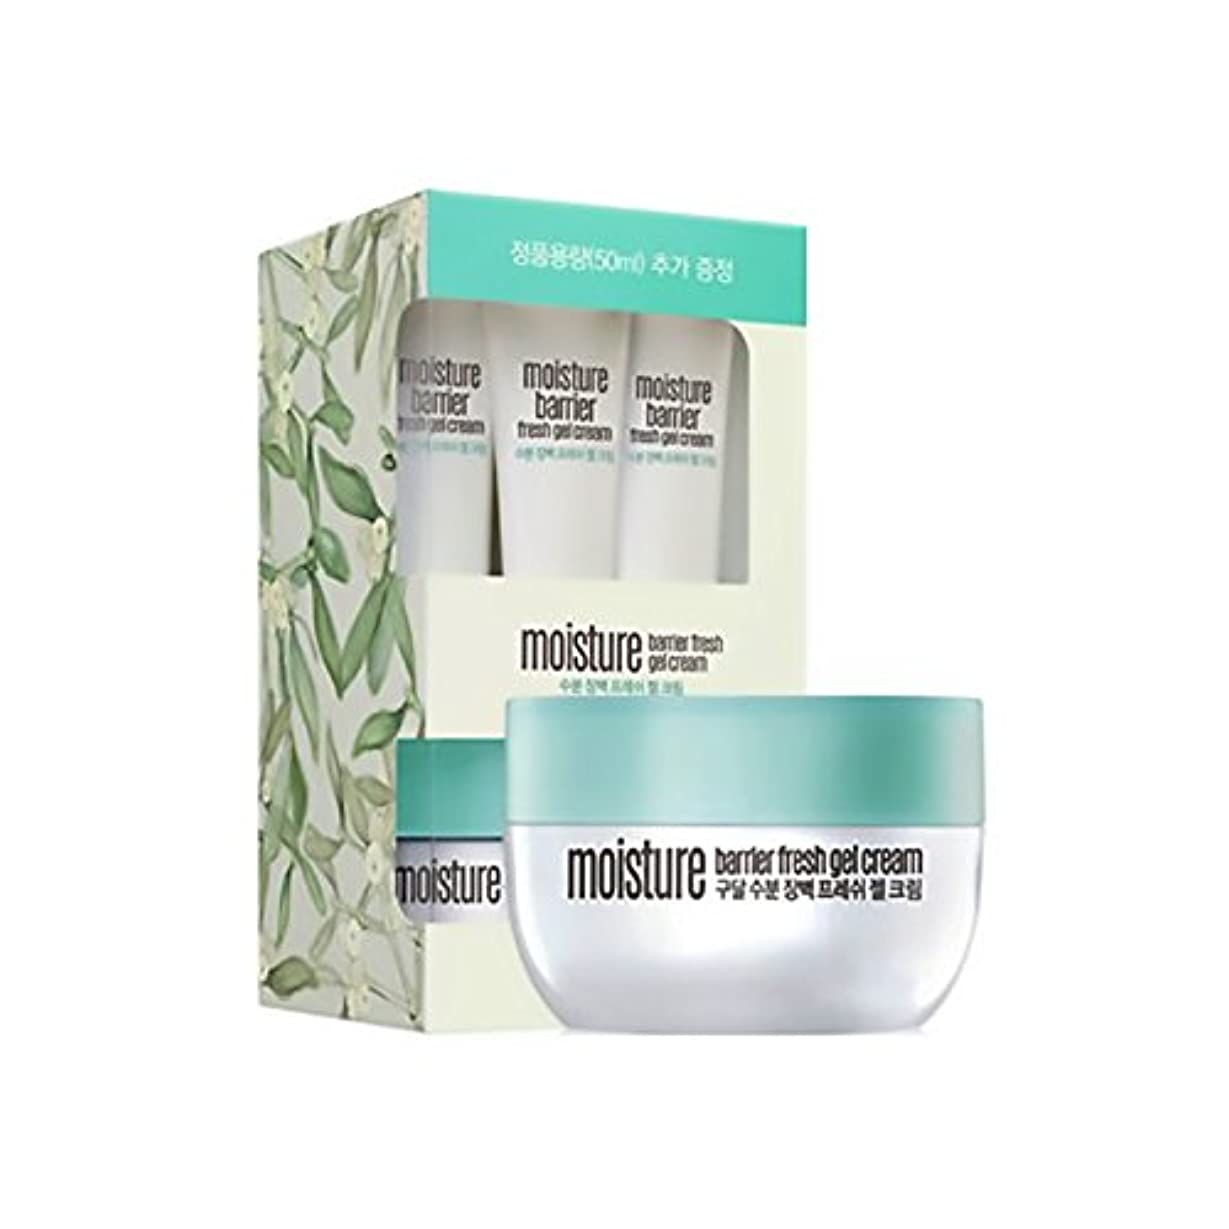 生産的化学防水goodal moisture barrier fresh gel cream set